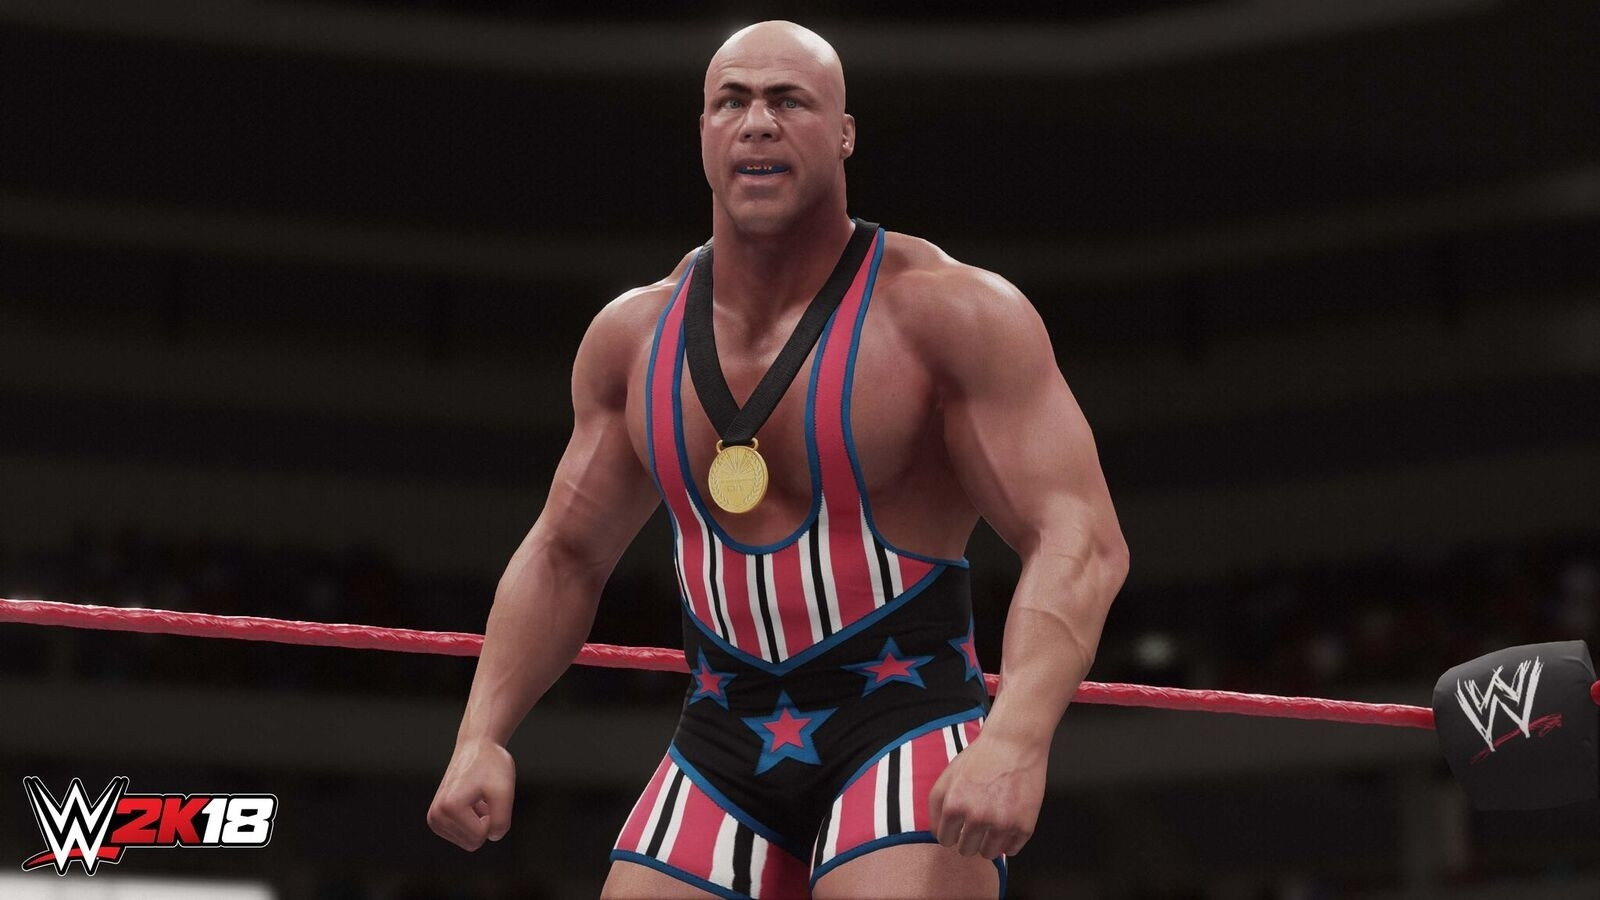 WWE 2K18 Kurt Angle